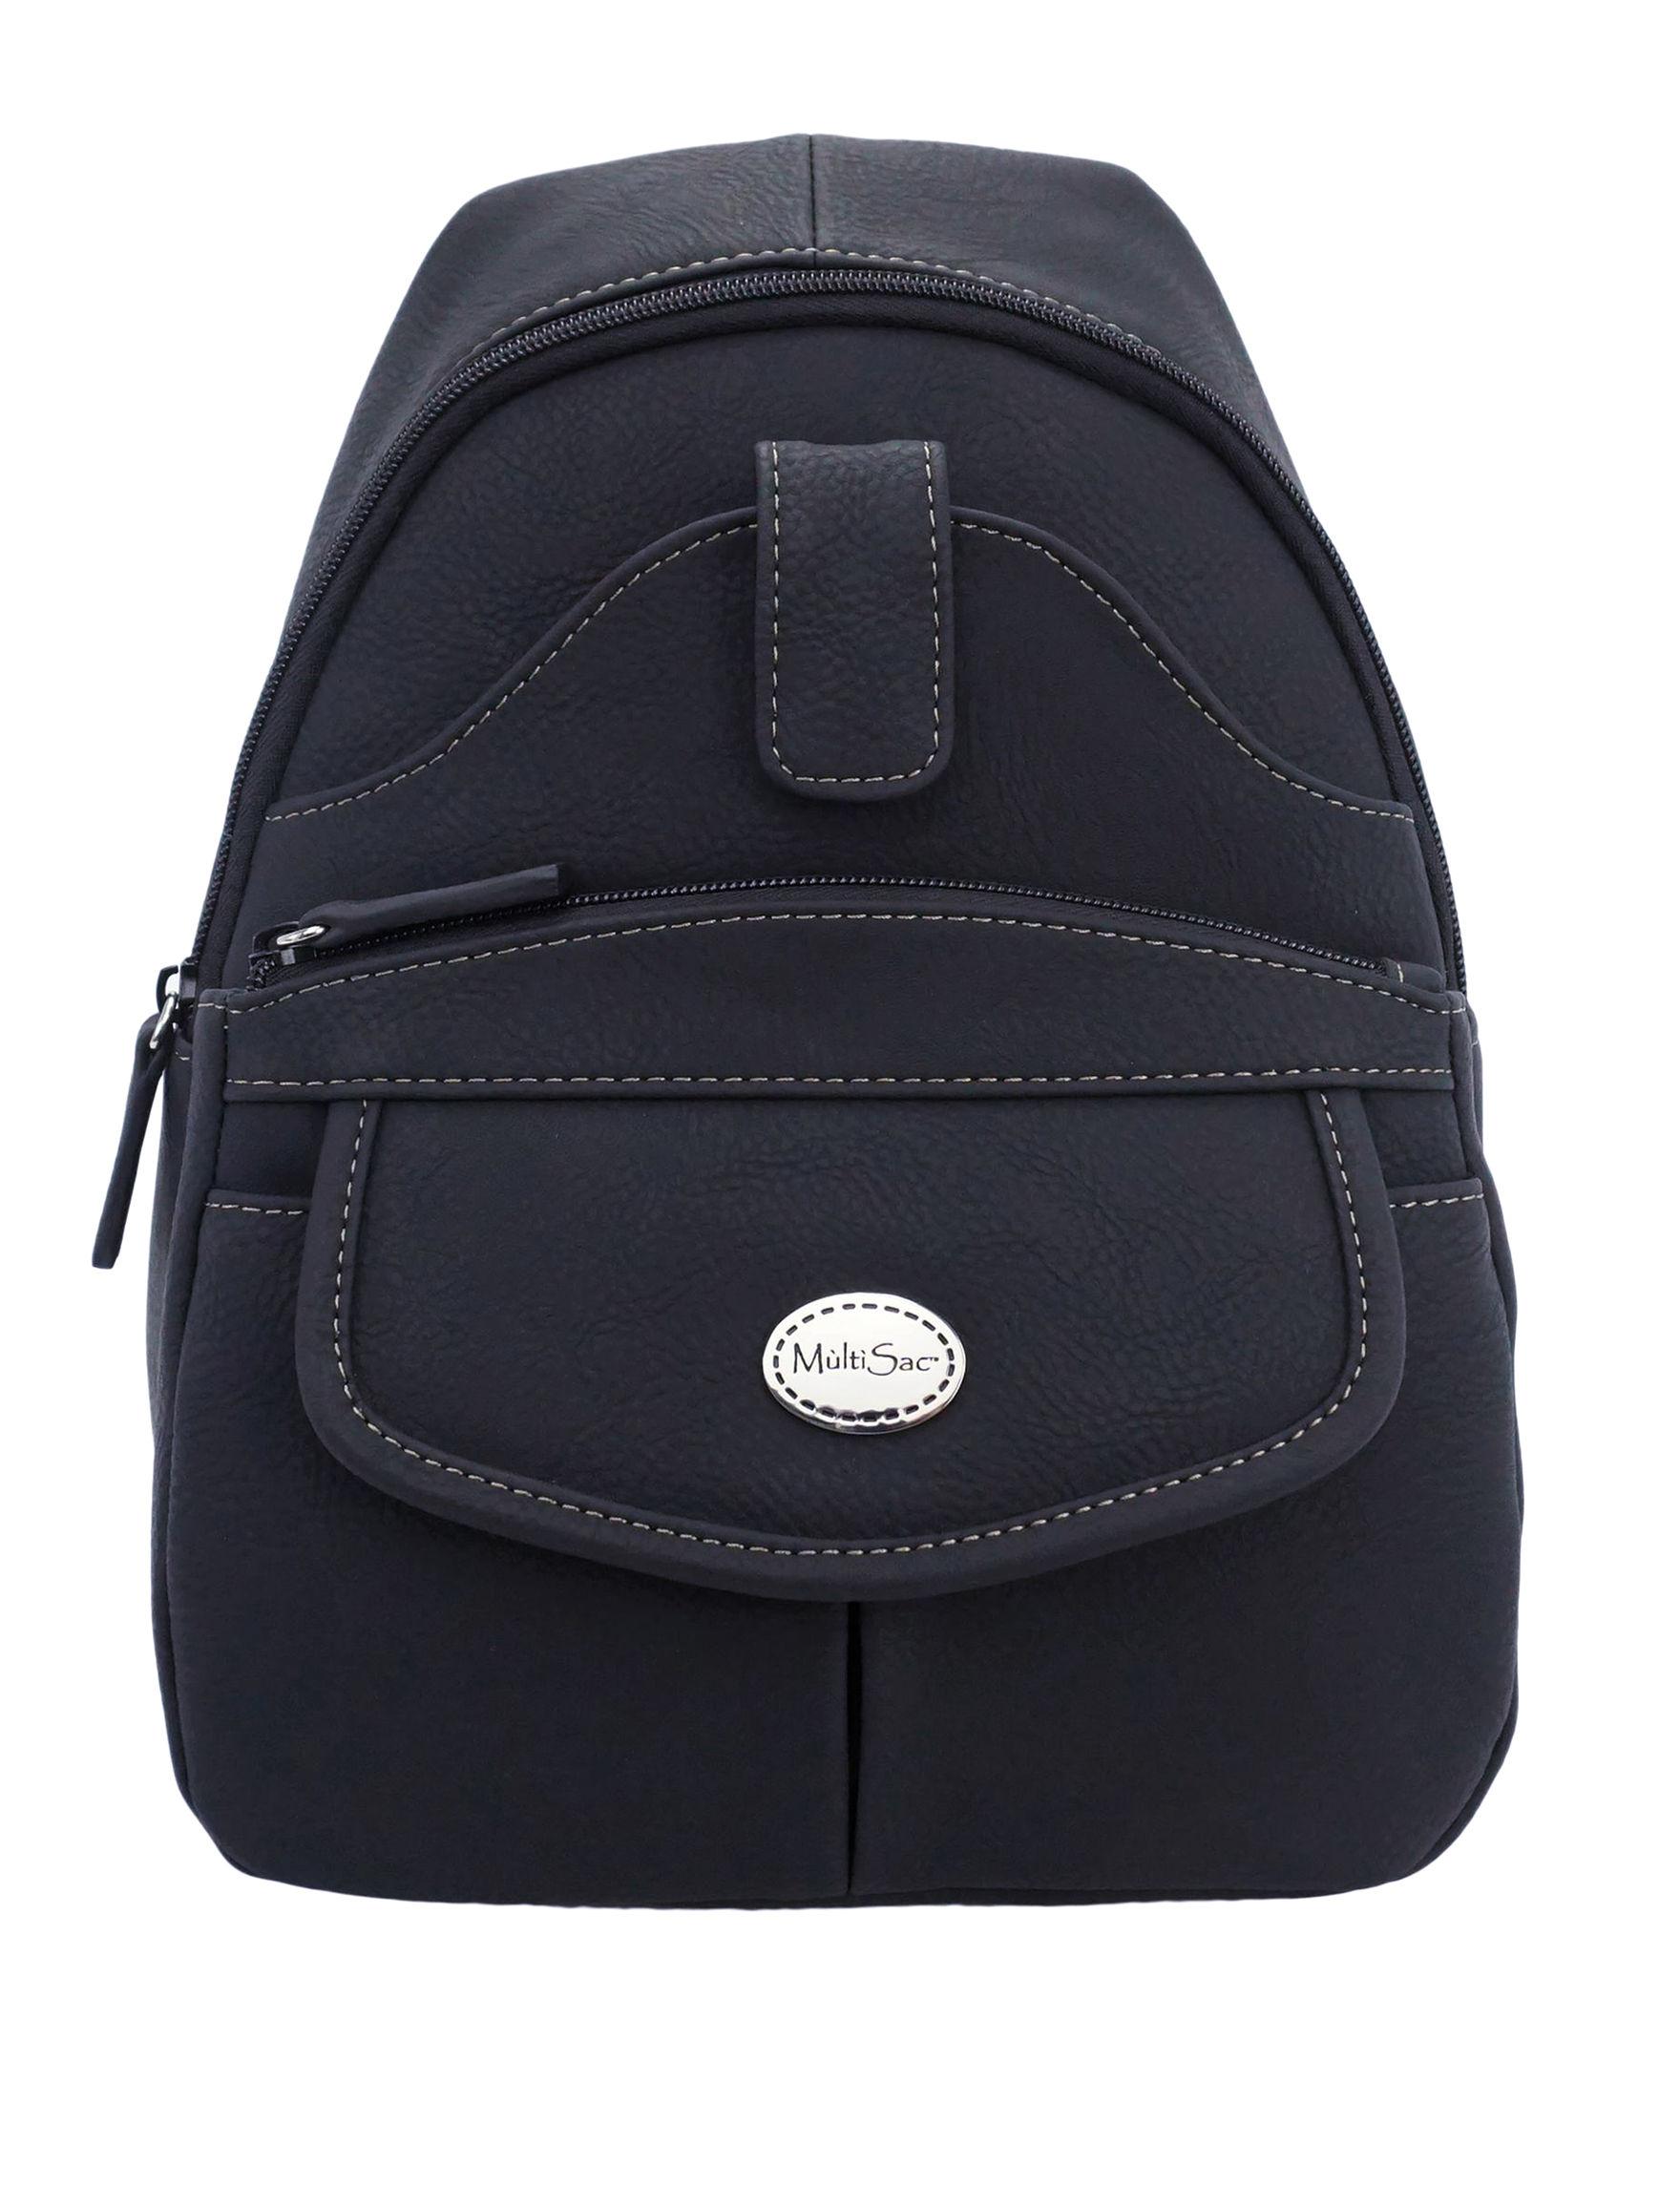 Koltov Black Bookbags & Backpacks